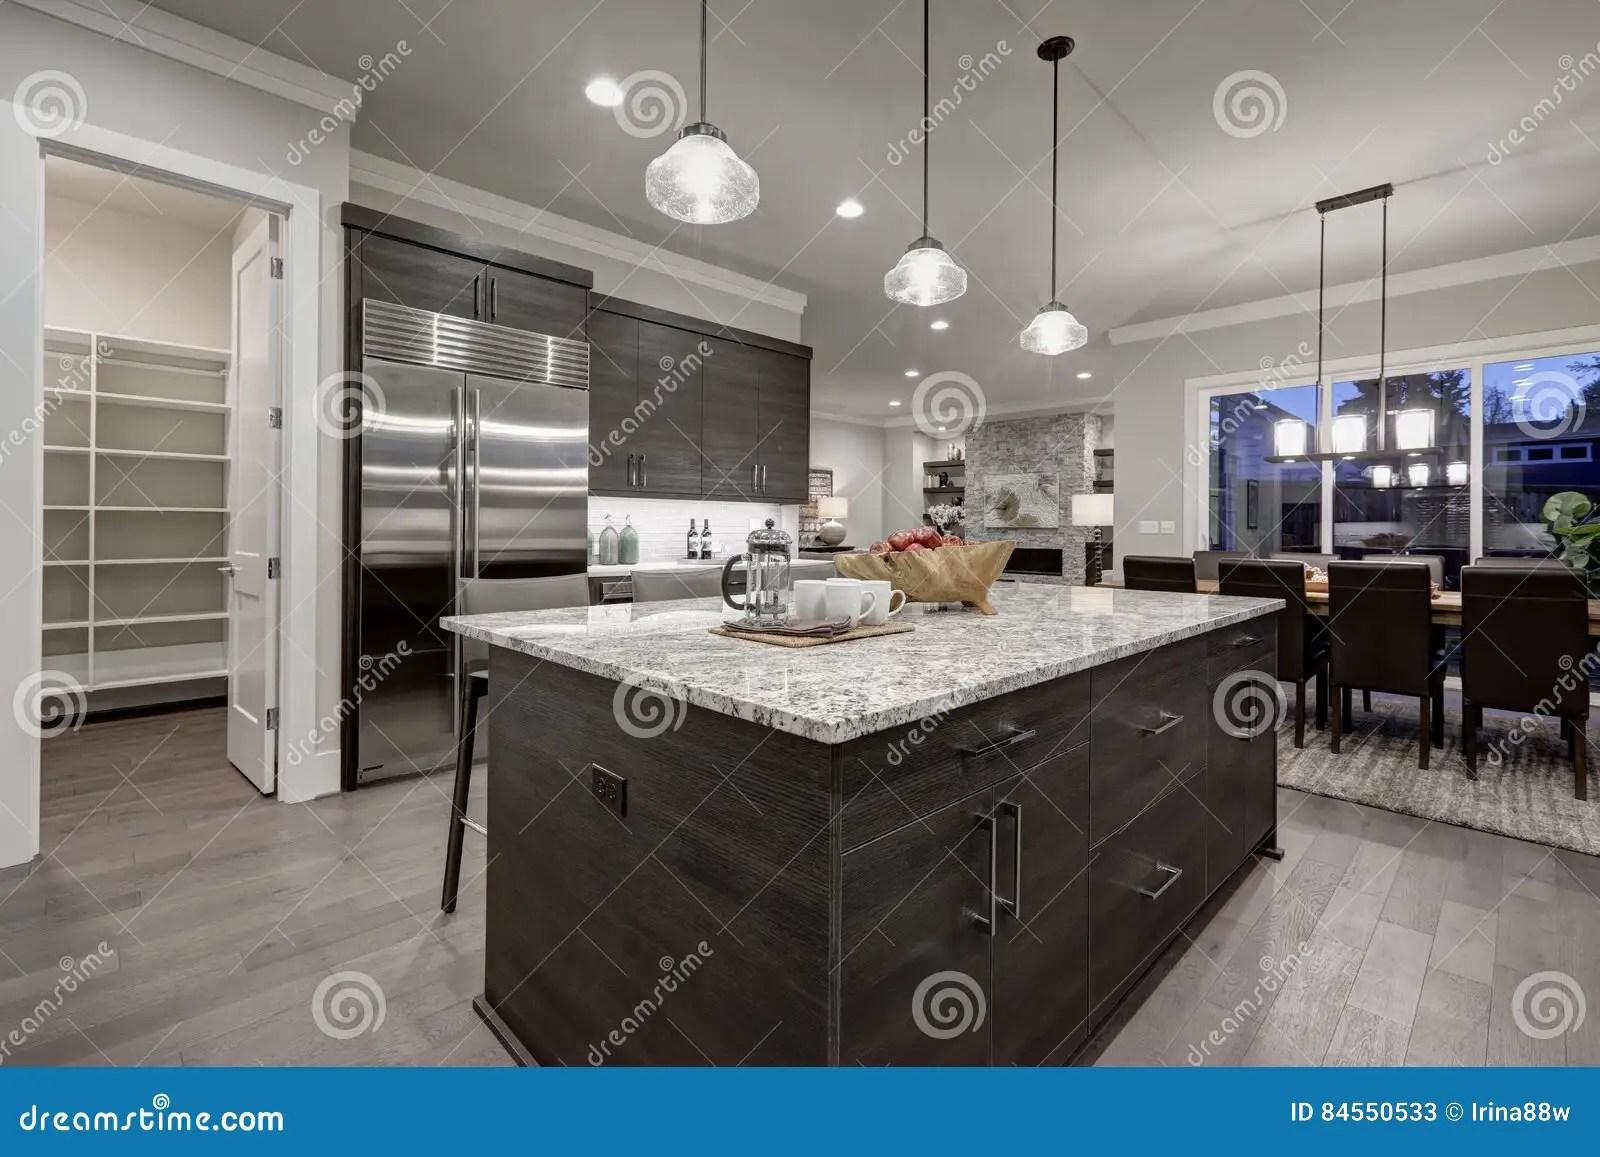 grey kitchen countertops glass front cabinets 现代灰色厨房以深灰细木家具为特色库存图片 图片包括有机柜 设计 不锈 现代开放学制灰色厨房以与花岗岩工作台面配对的深灰内阁为特色门户开放主义对餐具室西北 美国